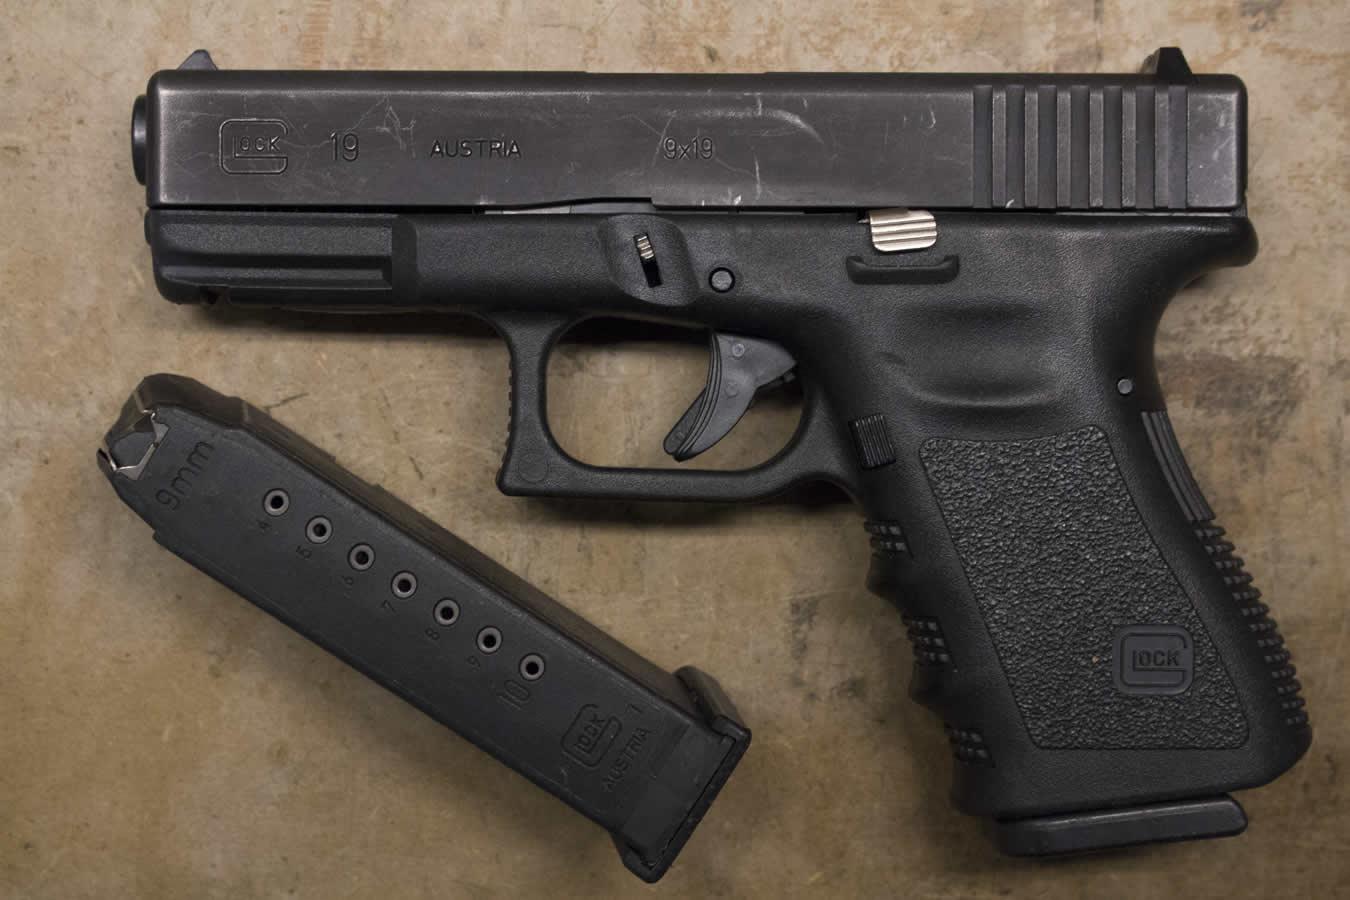 Glock 19 9mm Compliant 10-Round Police Trade-Ins (Gen 3) | Sportsman's ...